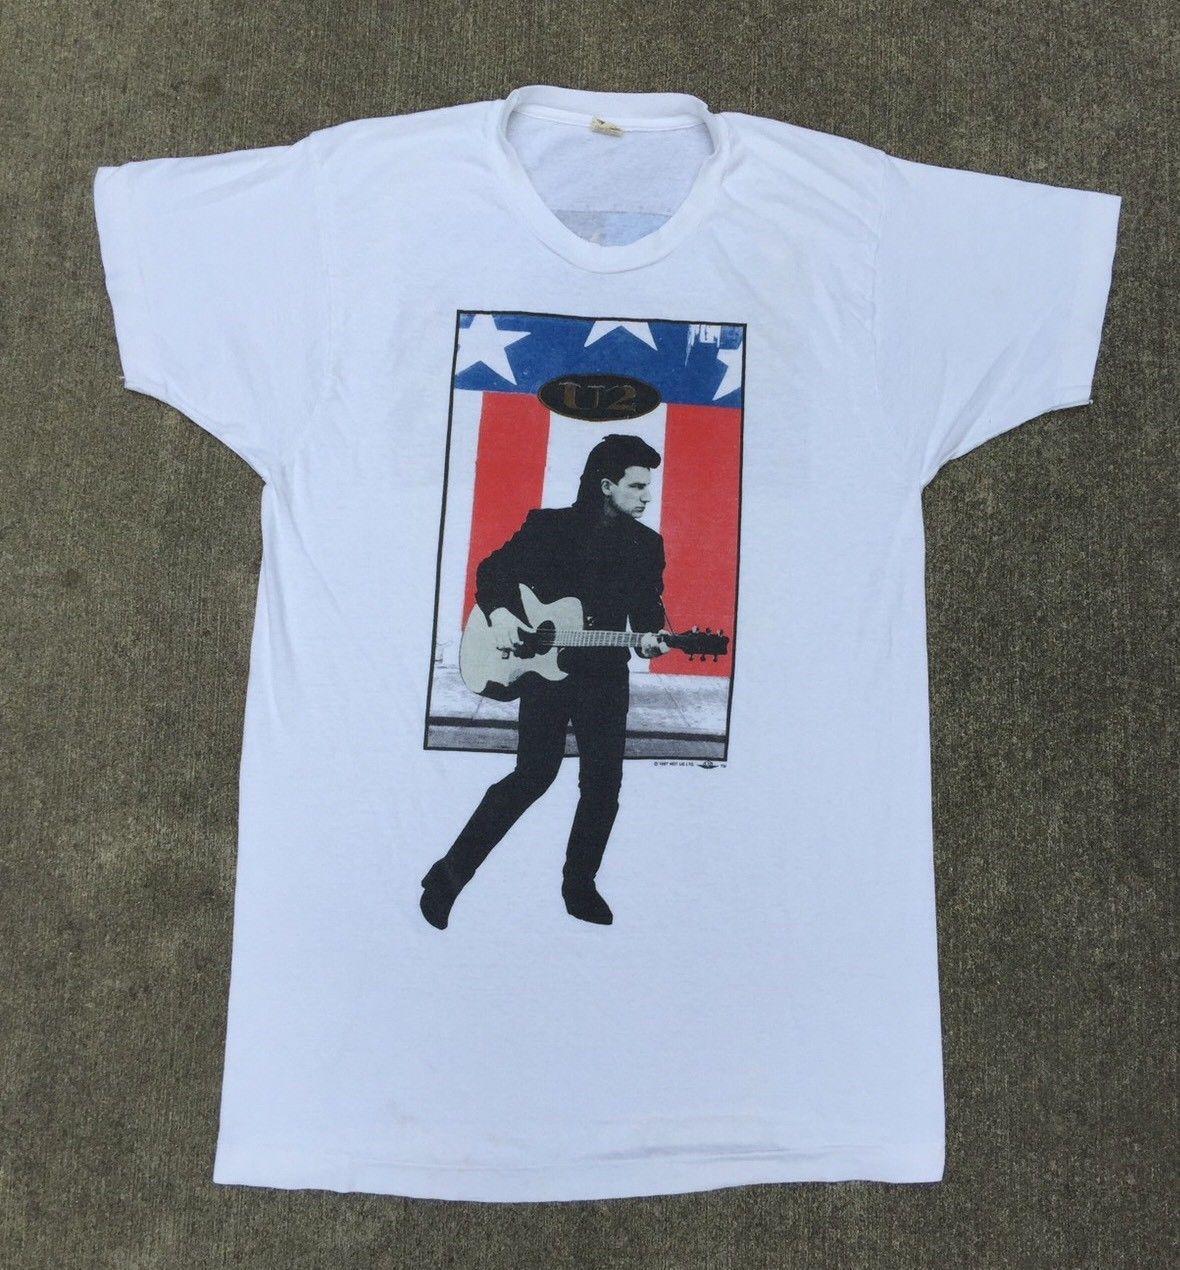 59fc6832 Vintage 80s Rock T Shirts « Alzheimer's Network of Oregon